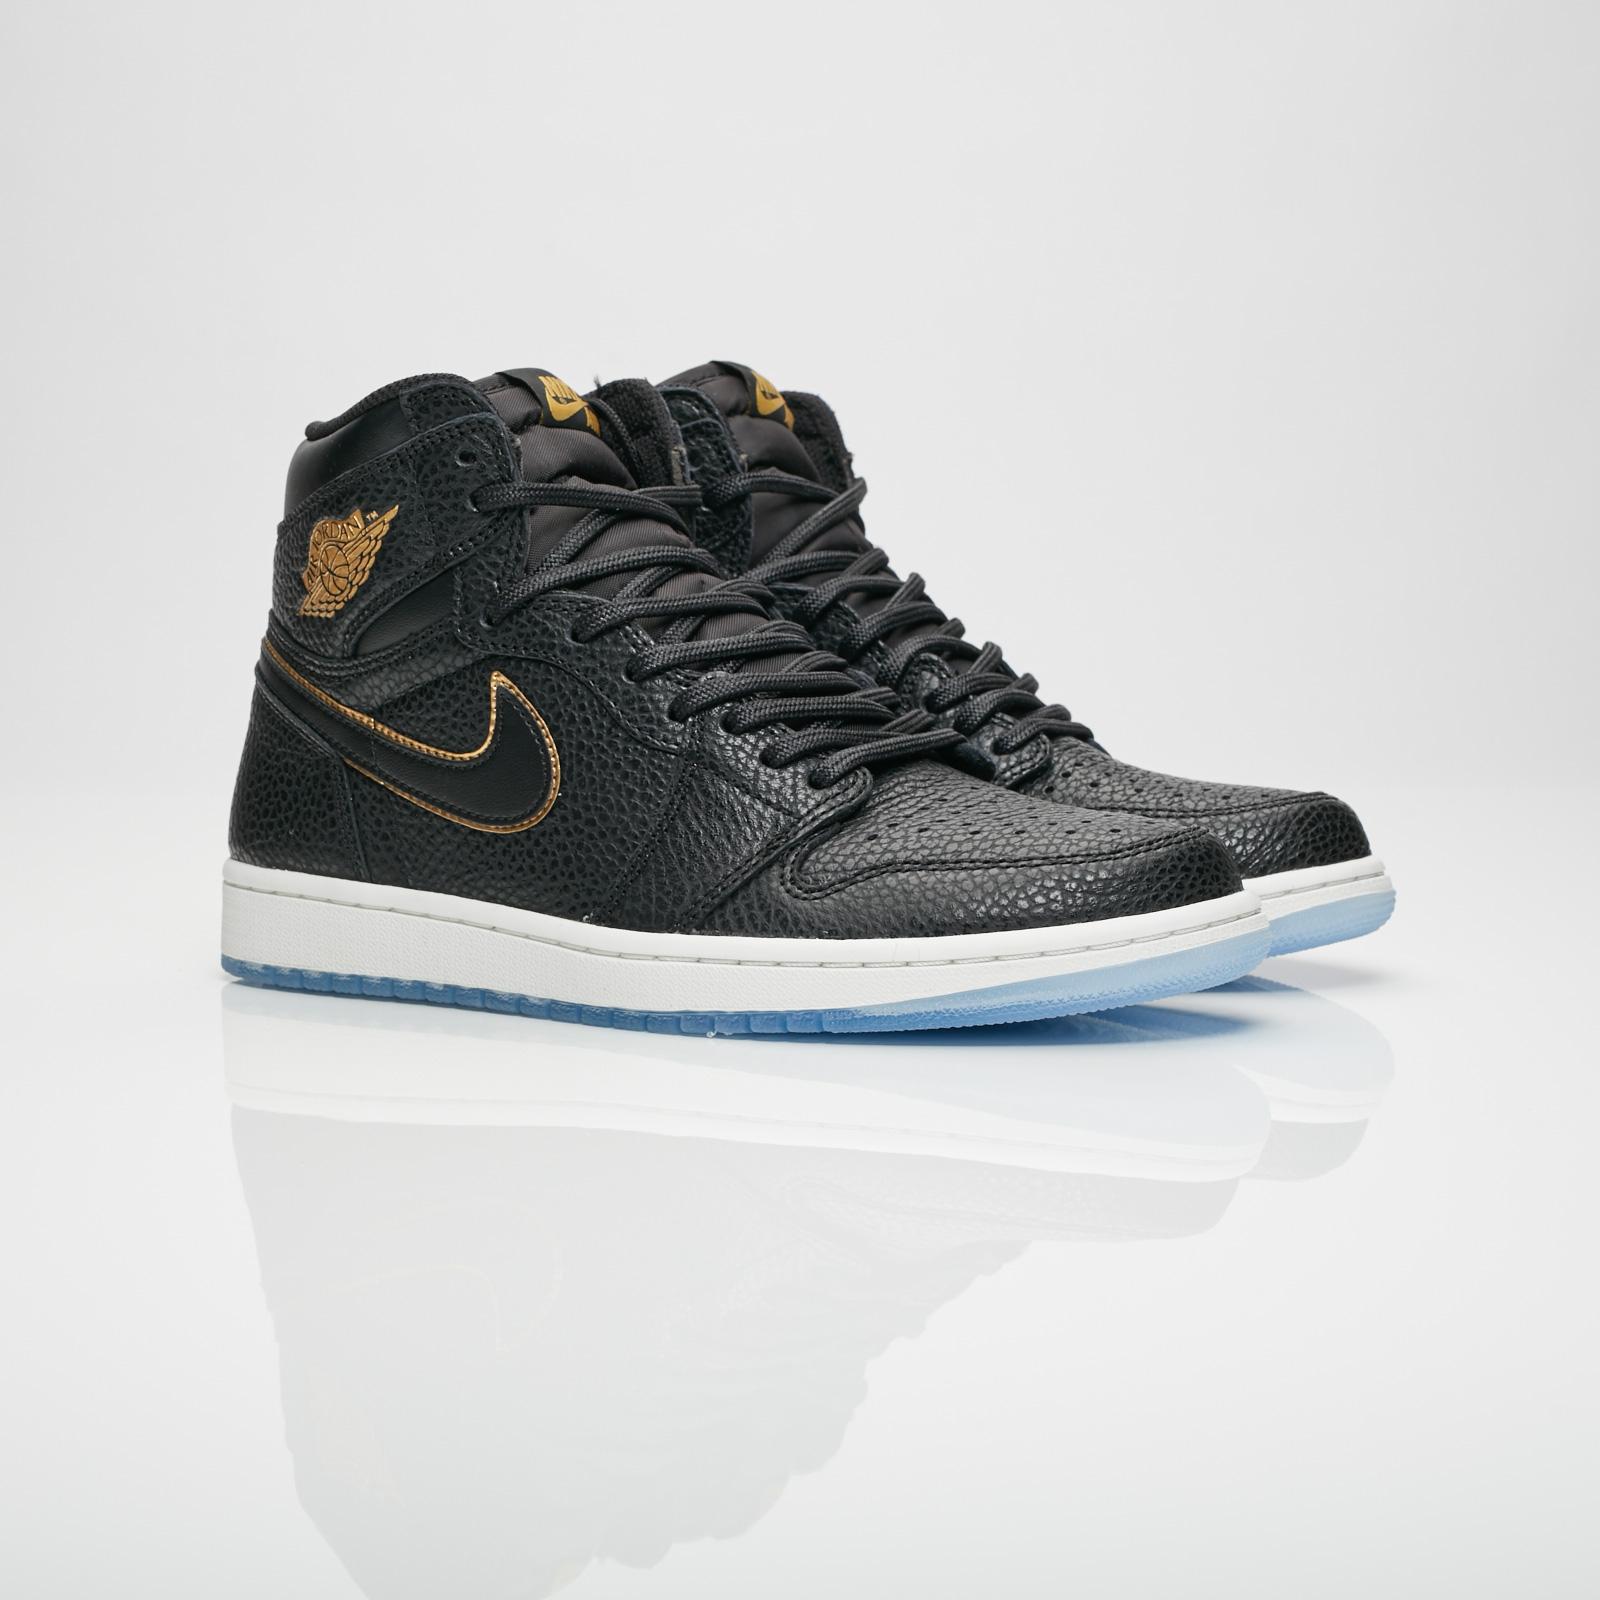 bde86b4087f3 Jordan Brand Air Jordan 1 Retro High OG - 555088-031 ...